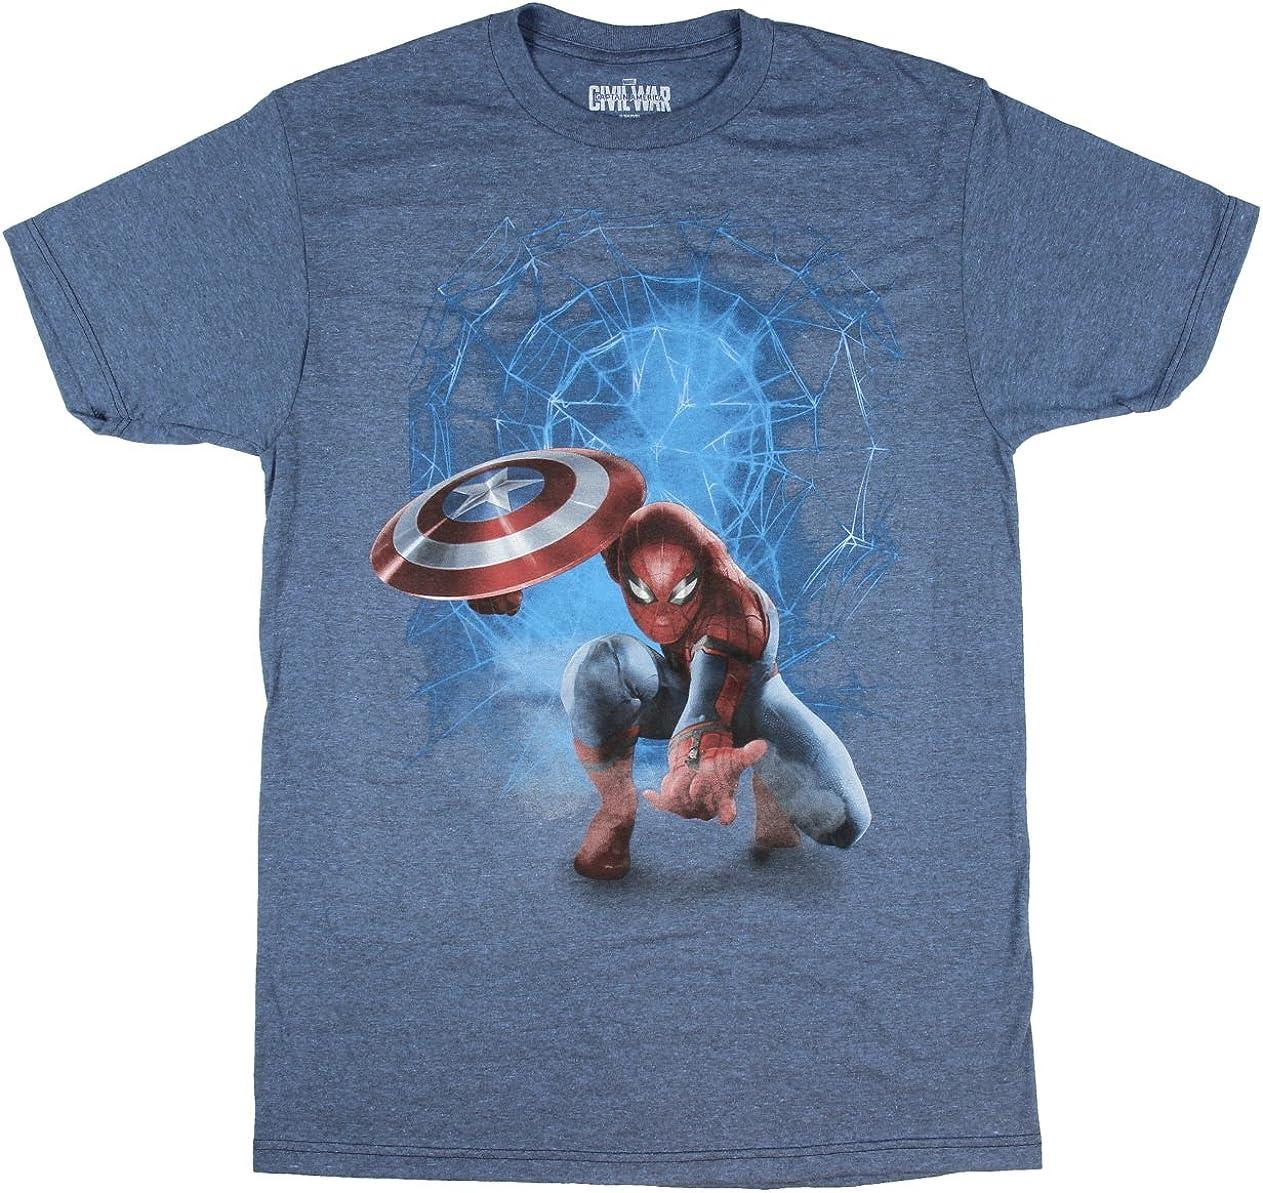 Marvel Comics Boys Civil War Graphic T-Shirt